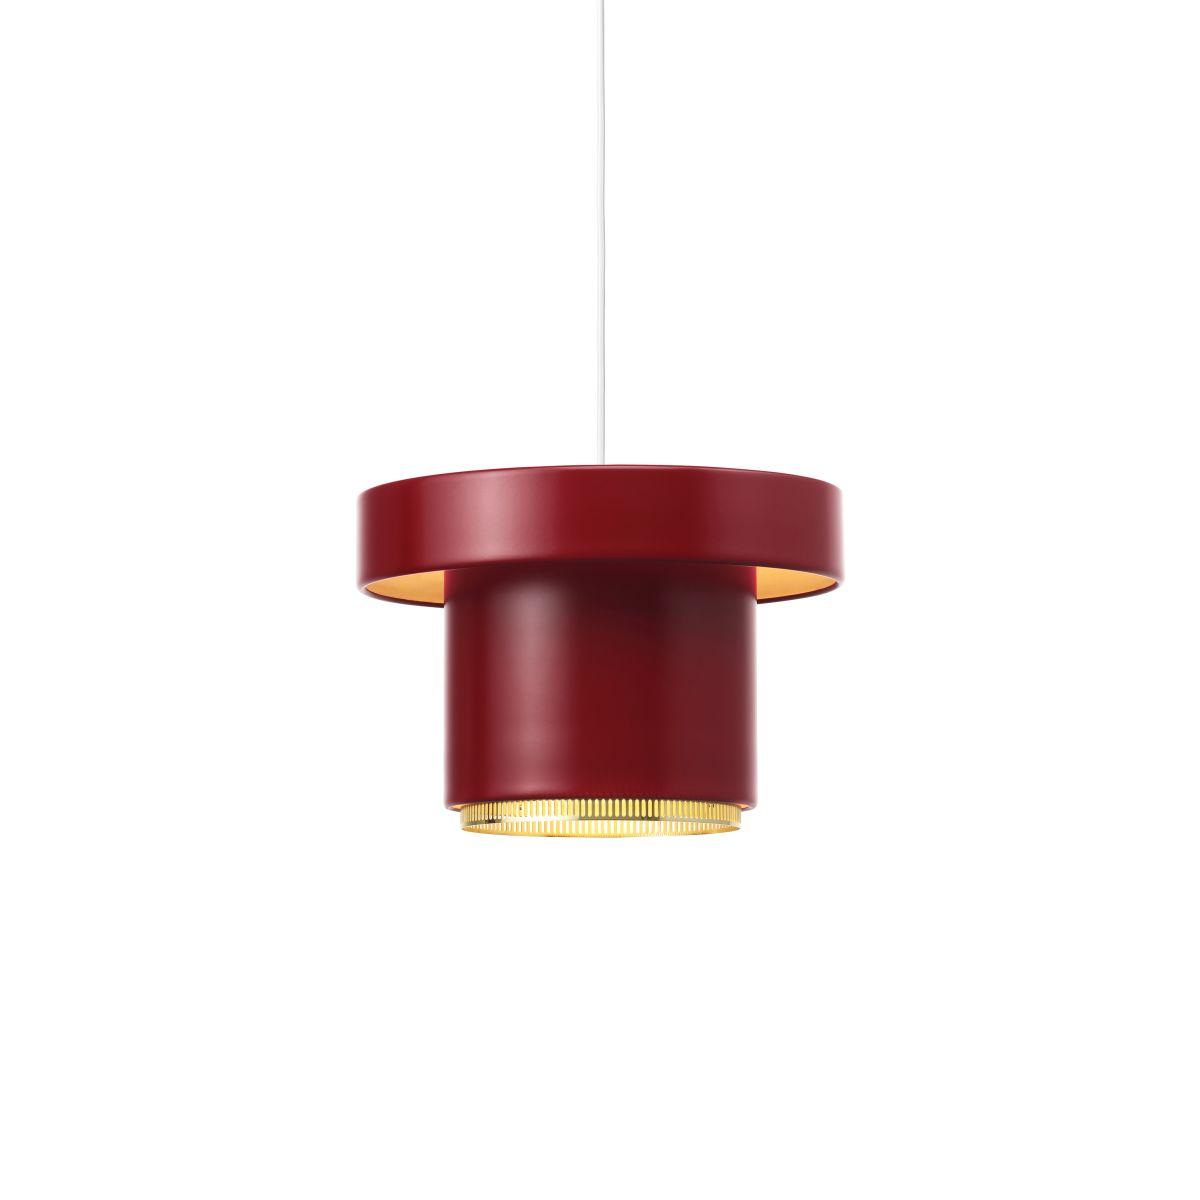 A201 red/brass light on_F